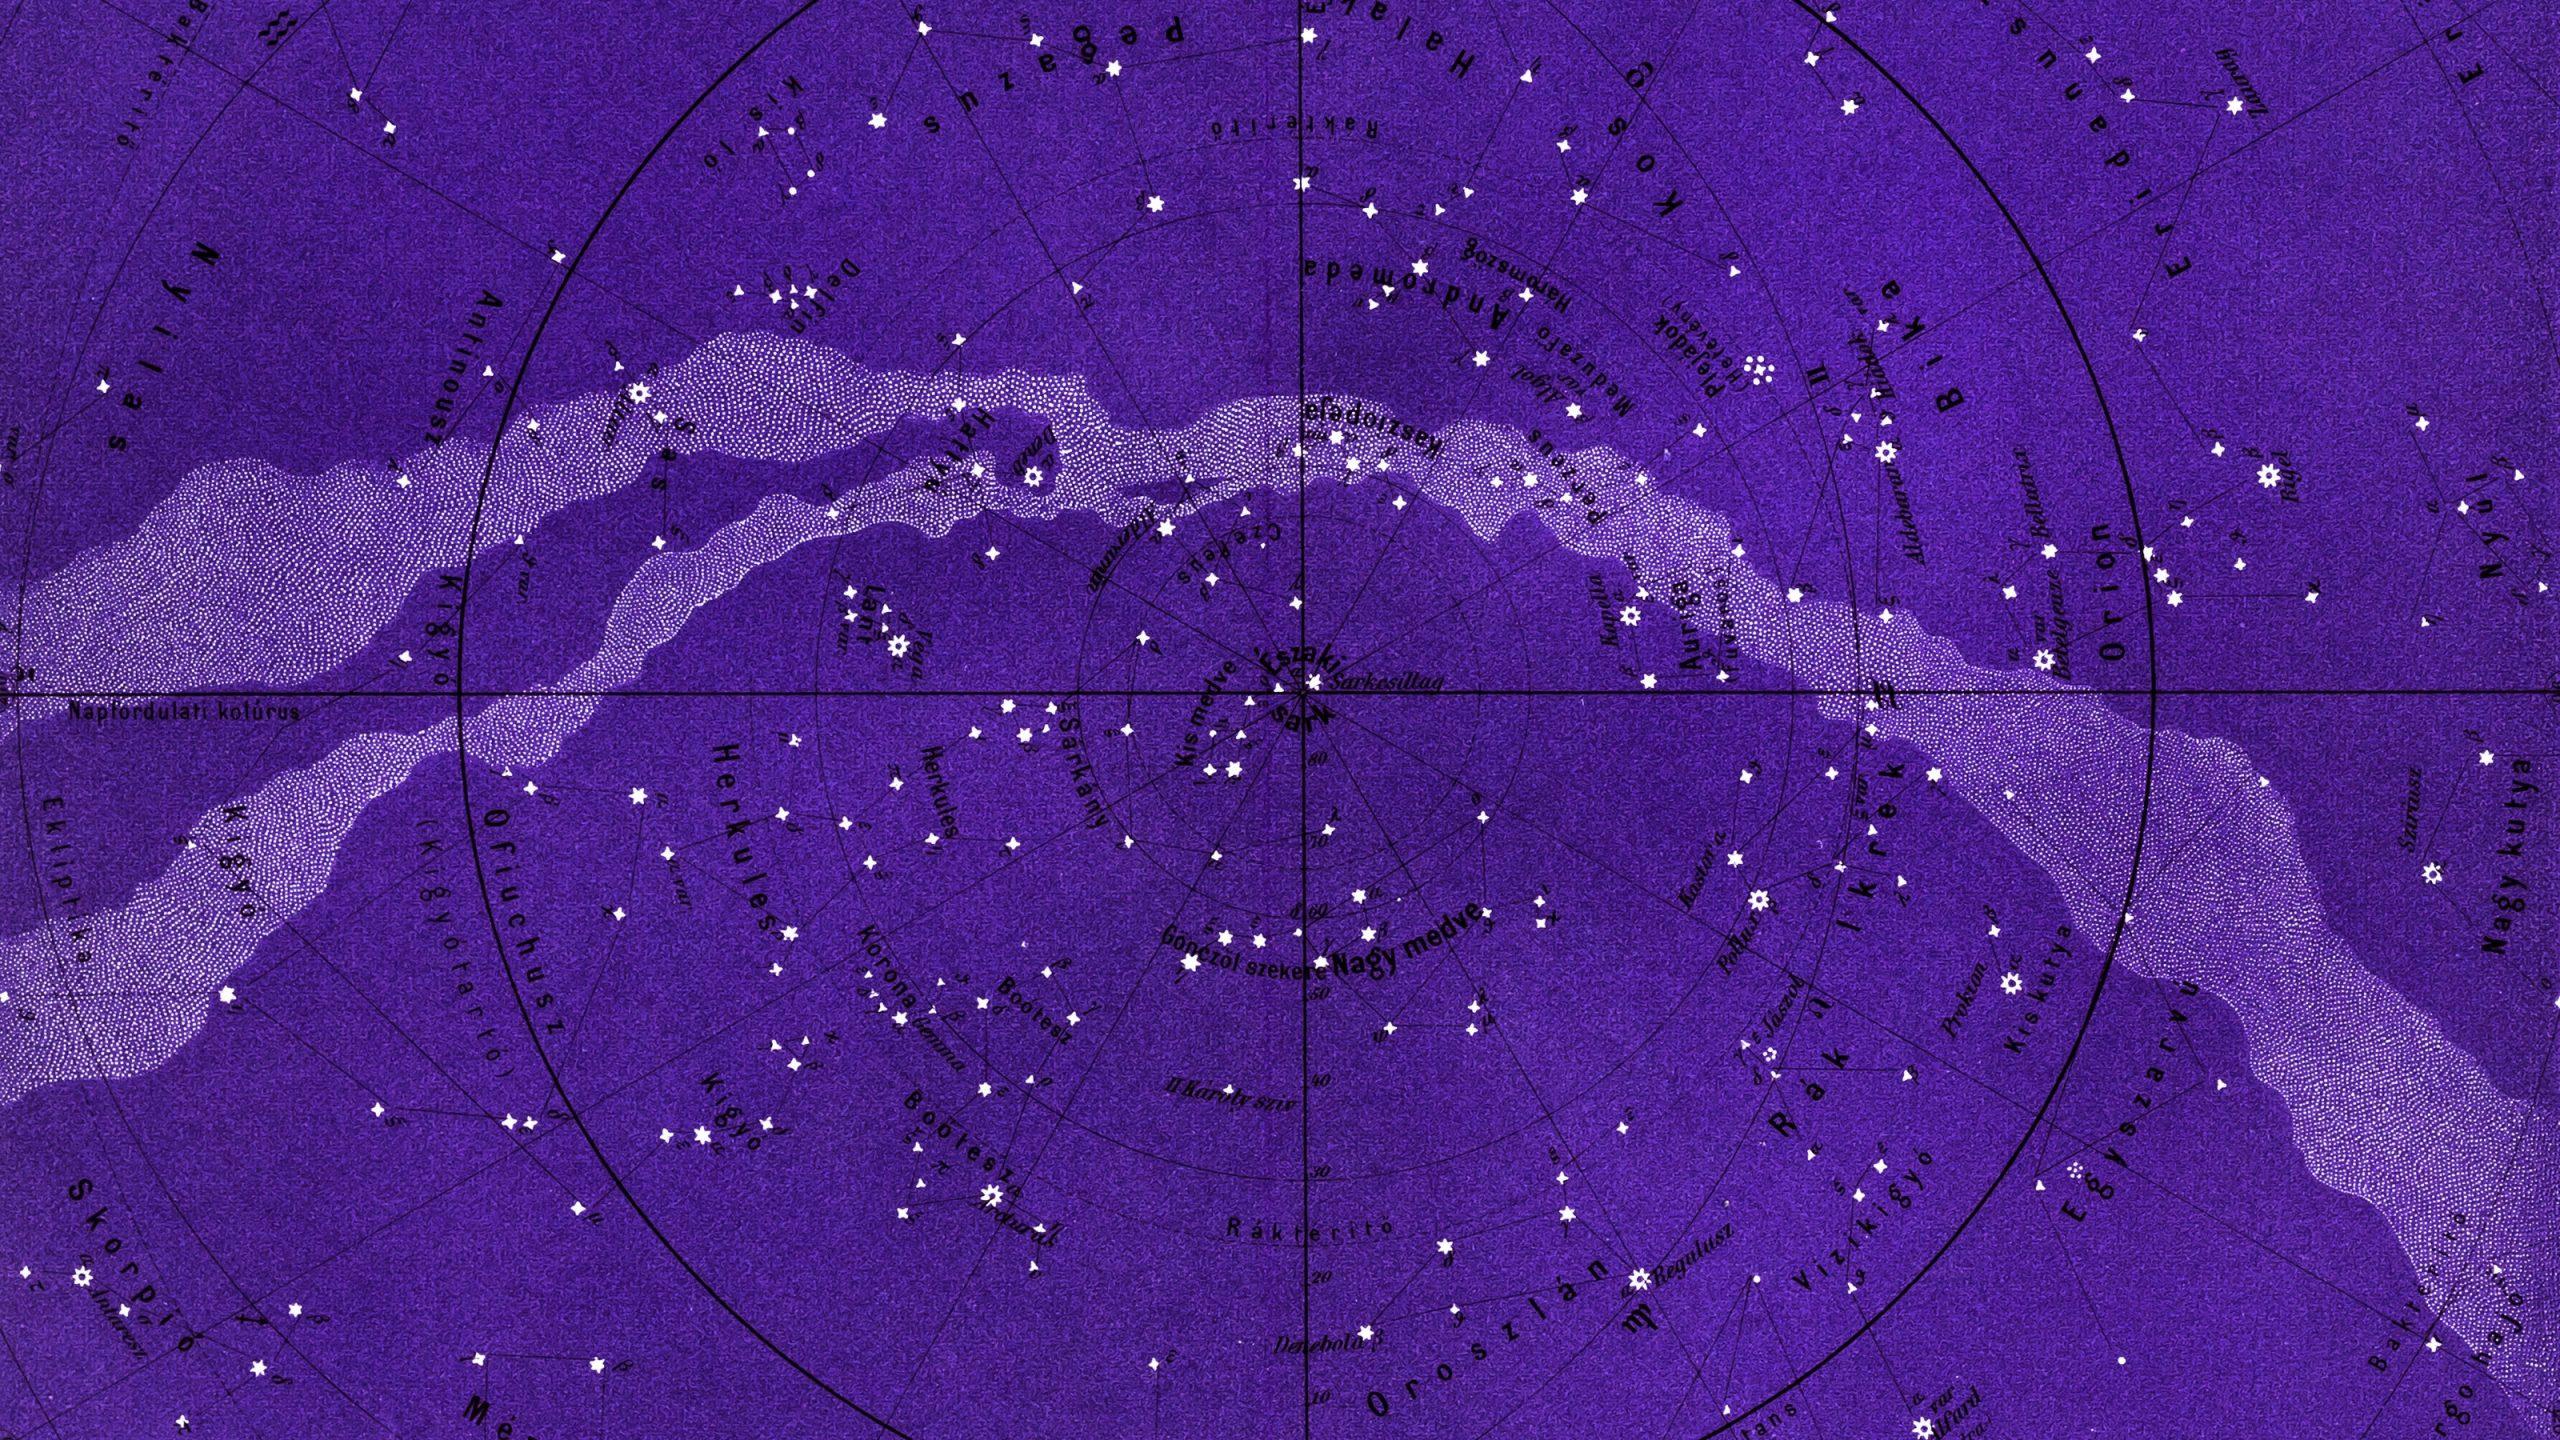 Horoscop vineri 4 septembrie 2020. Ce surprize ne aduce ultima zi a săptămânii